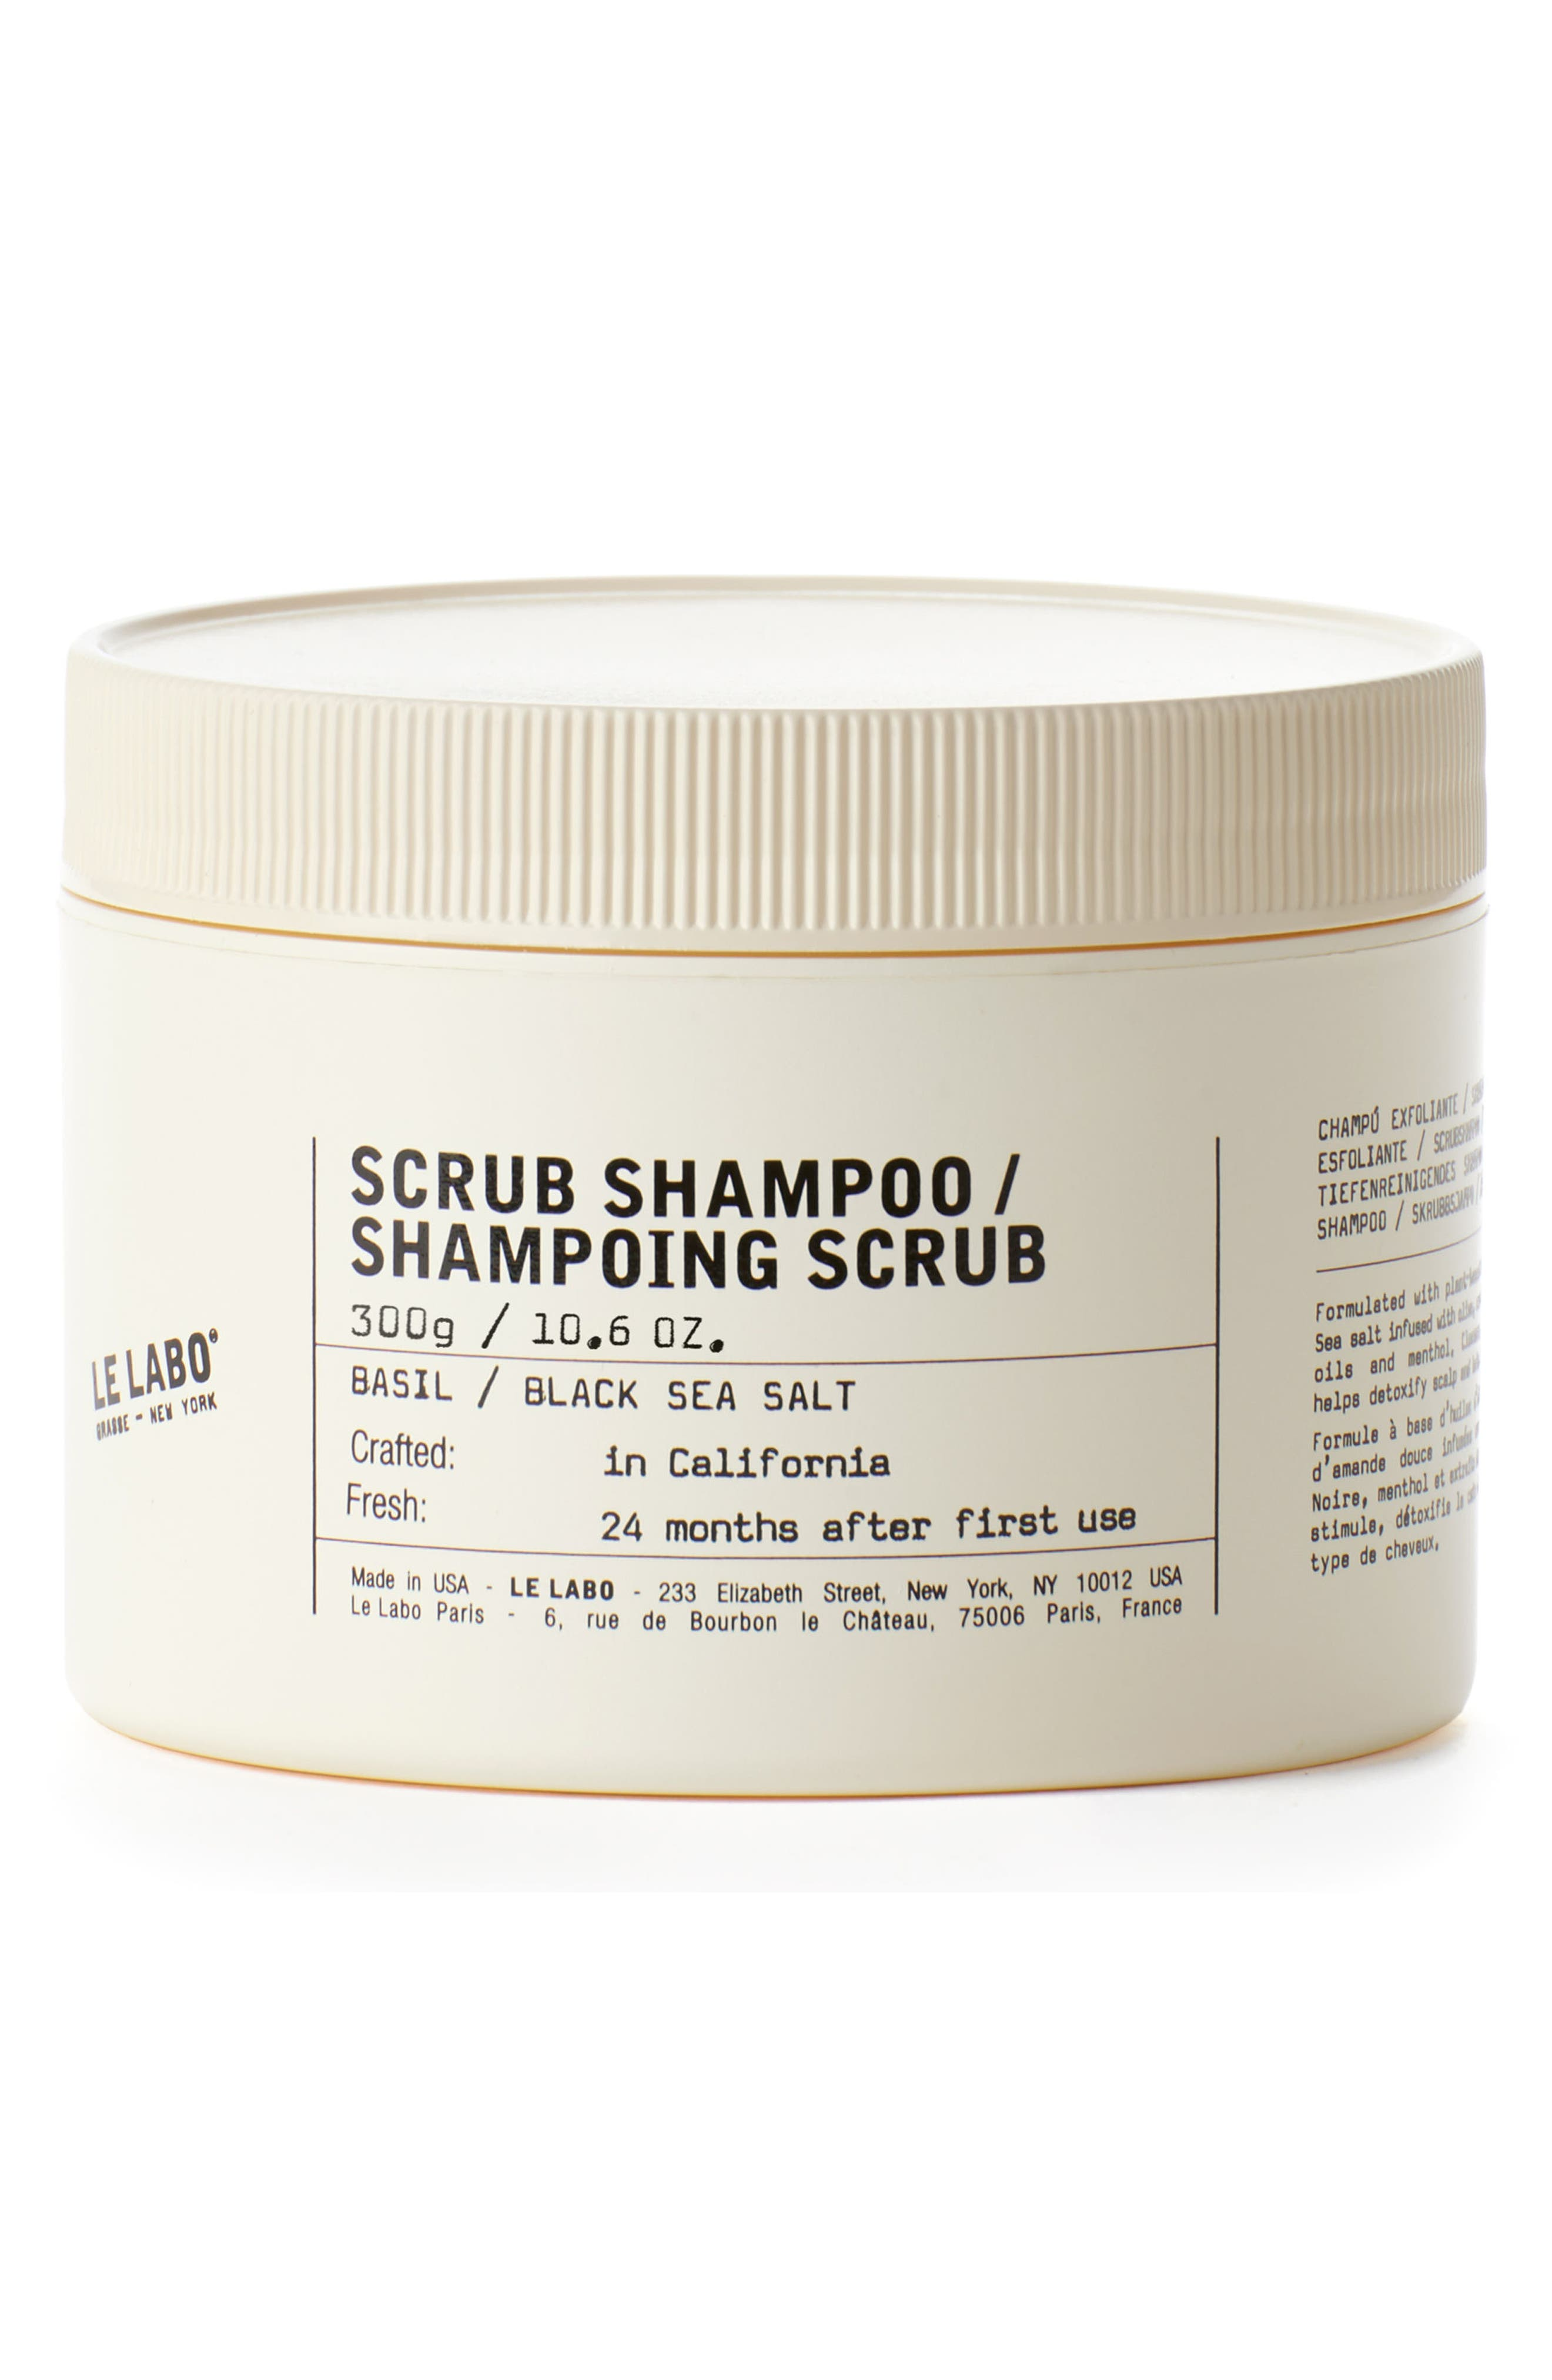 Le Labo Scrub Shampoo